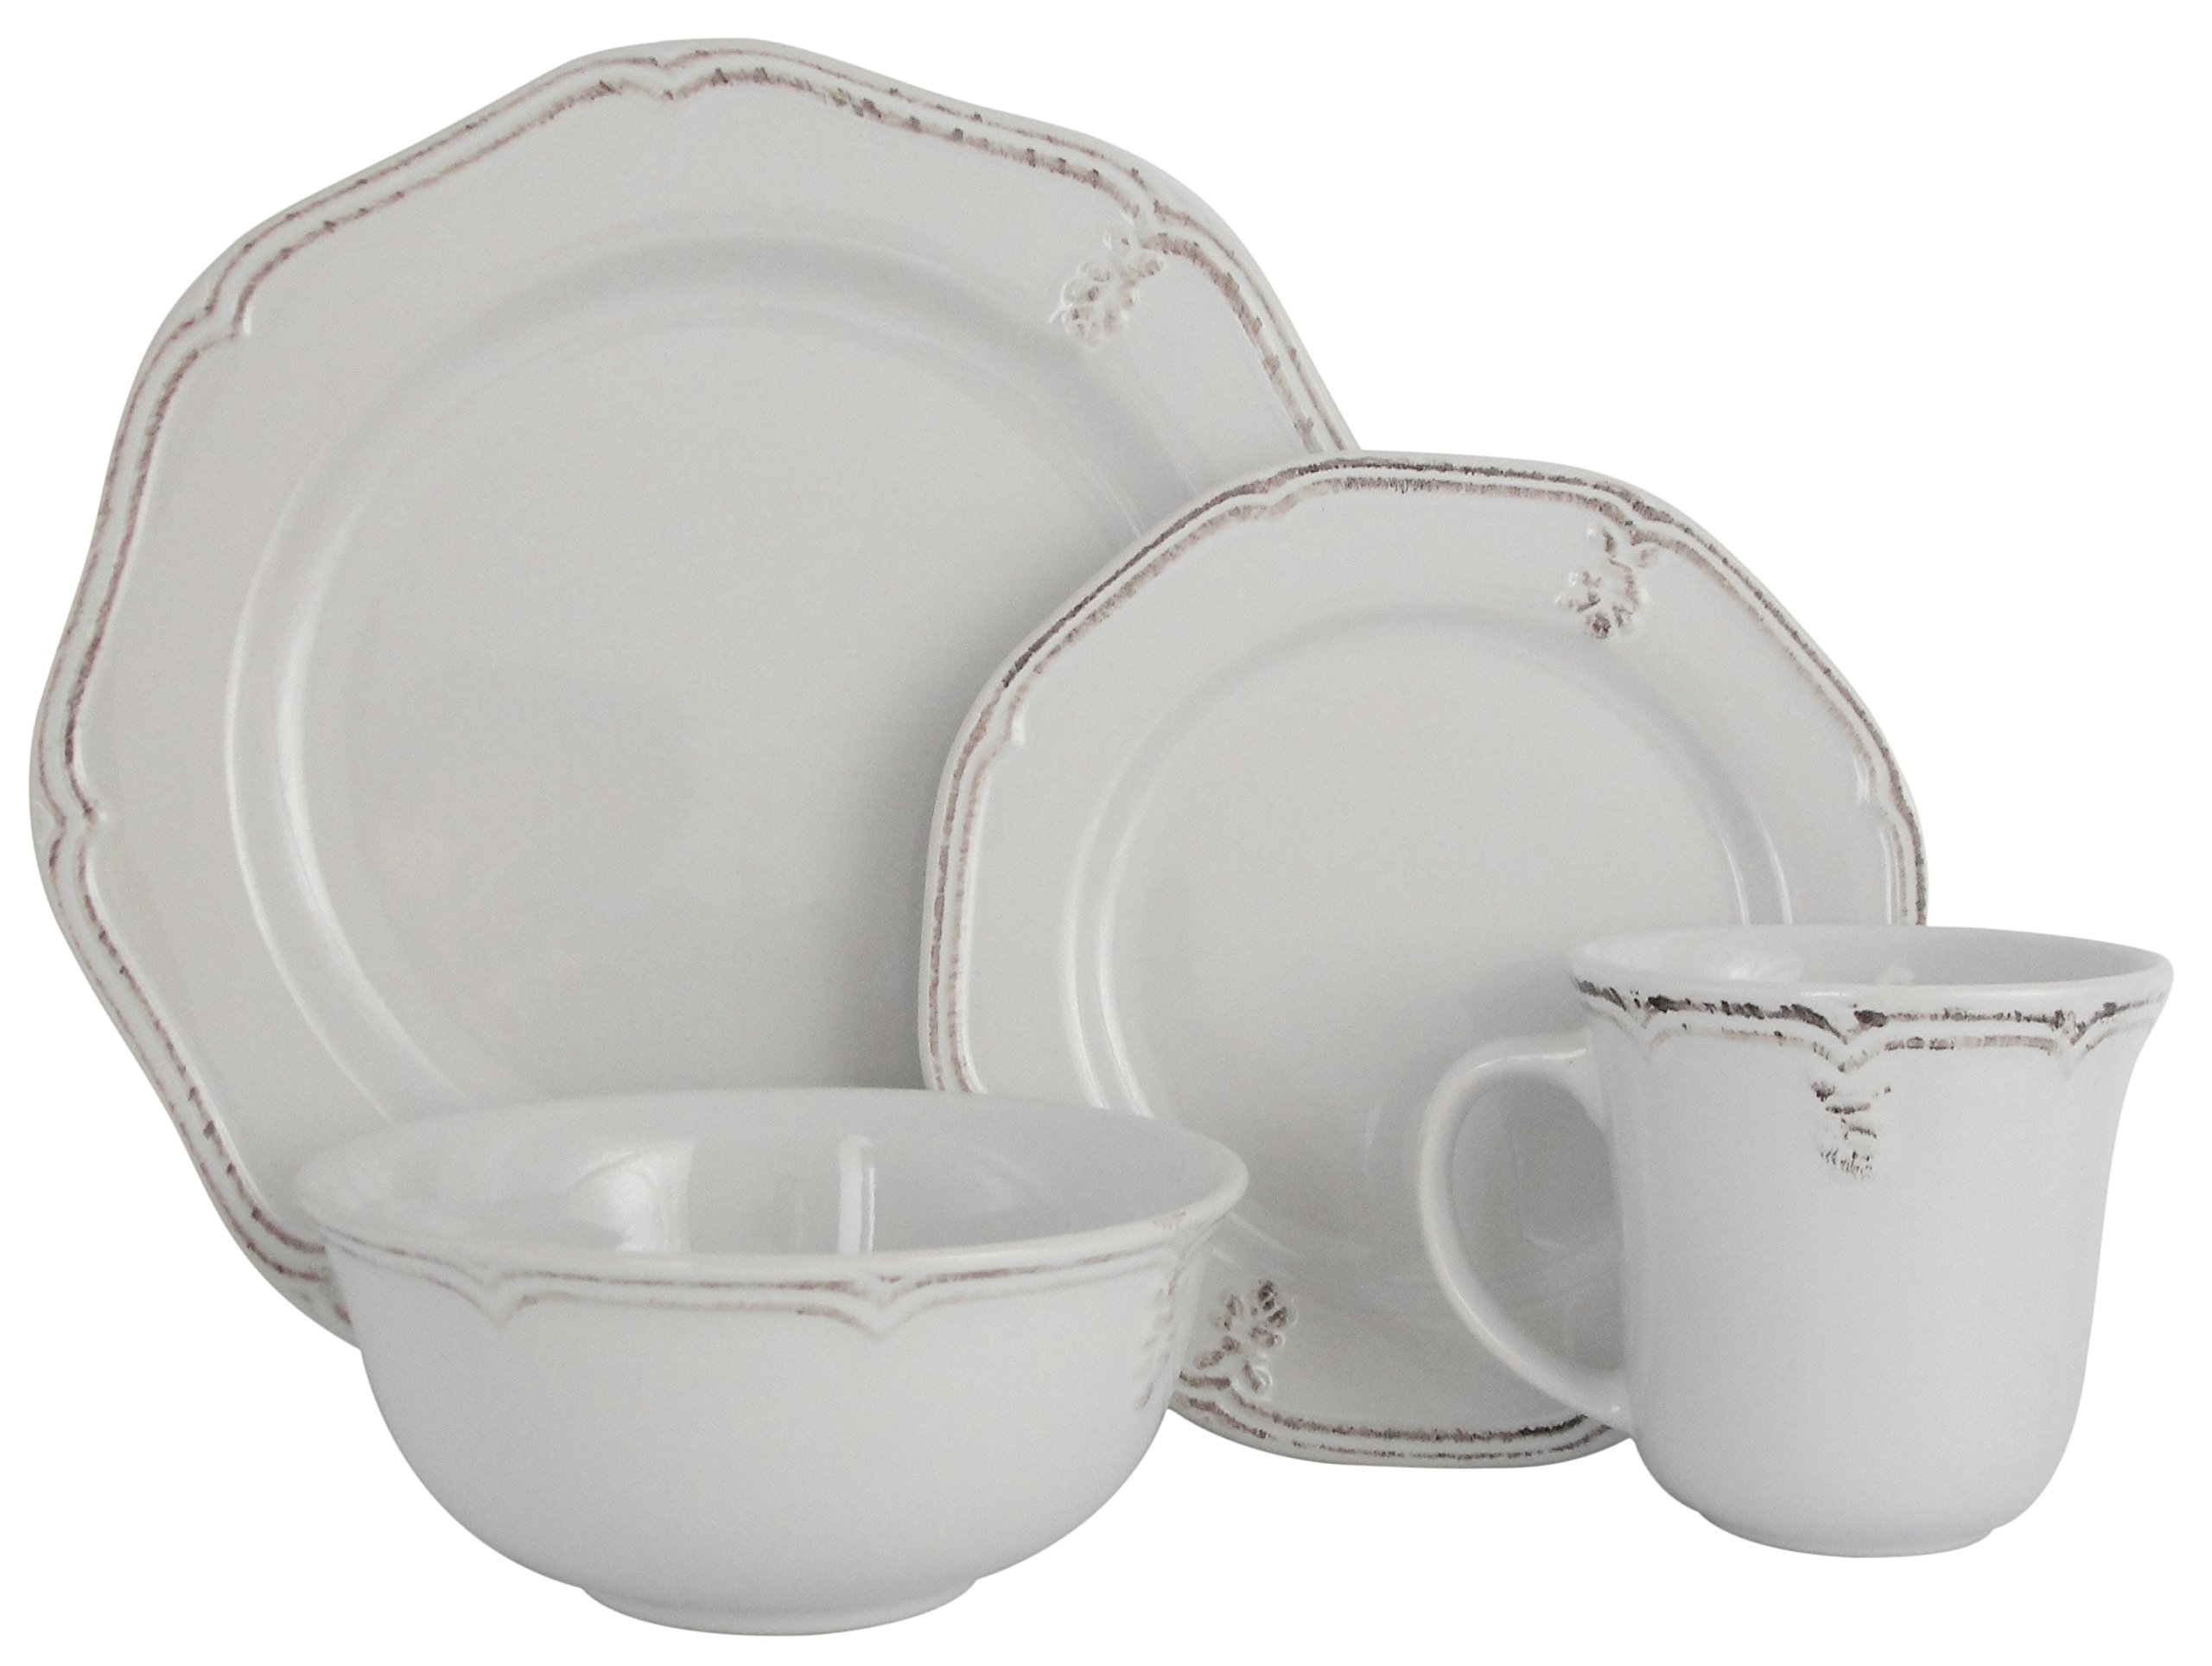 Melange Stoneware 16-Piece Dinnerware Set (Antique White)   Service for 4  Microwave, Dishwasher & Oven Safe   Dinner Plate, Salad Plate, Soup Bowl & Mug (4 Each)